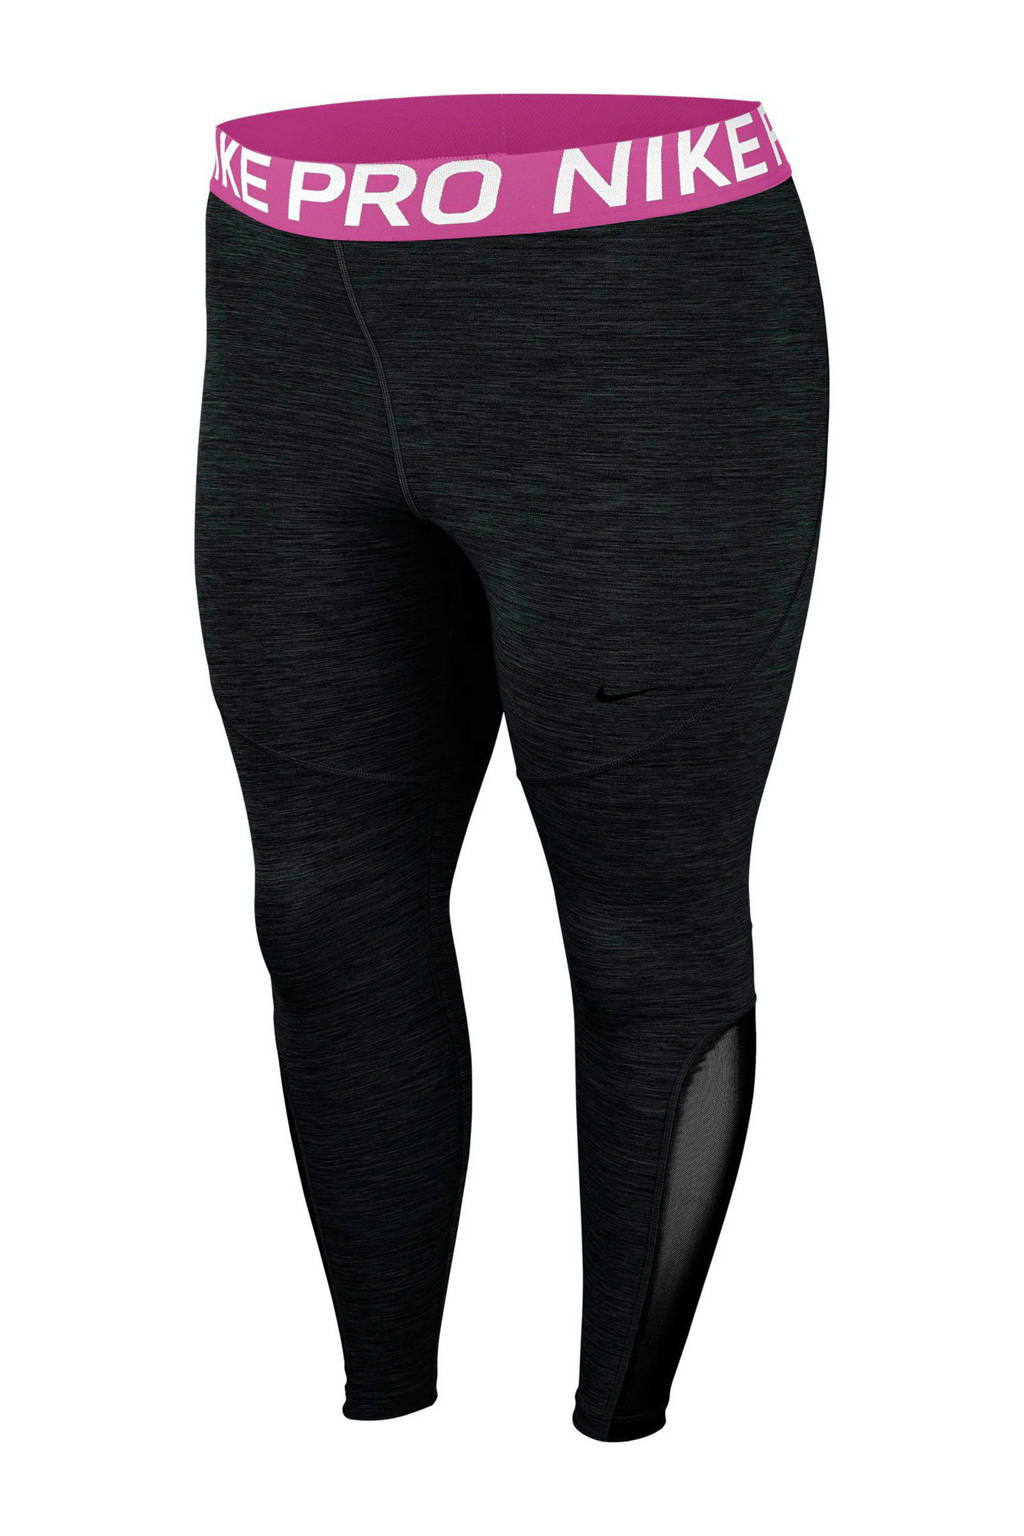 Nike Plus Size sportbroek zwart, Zwart/fuchsia